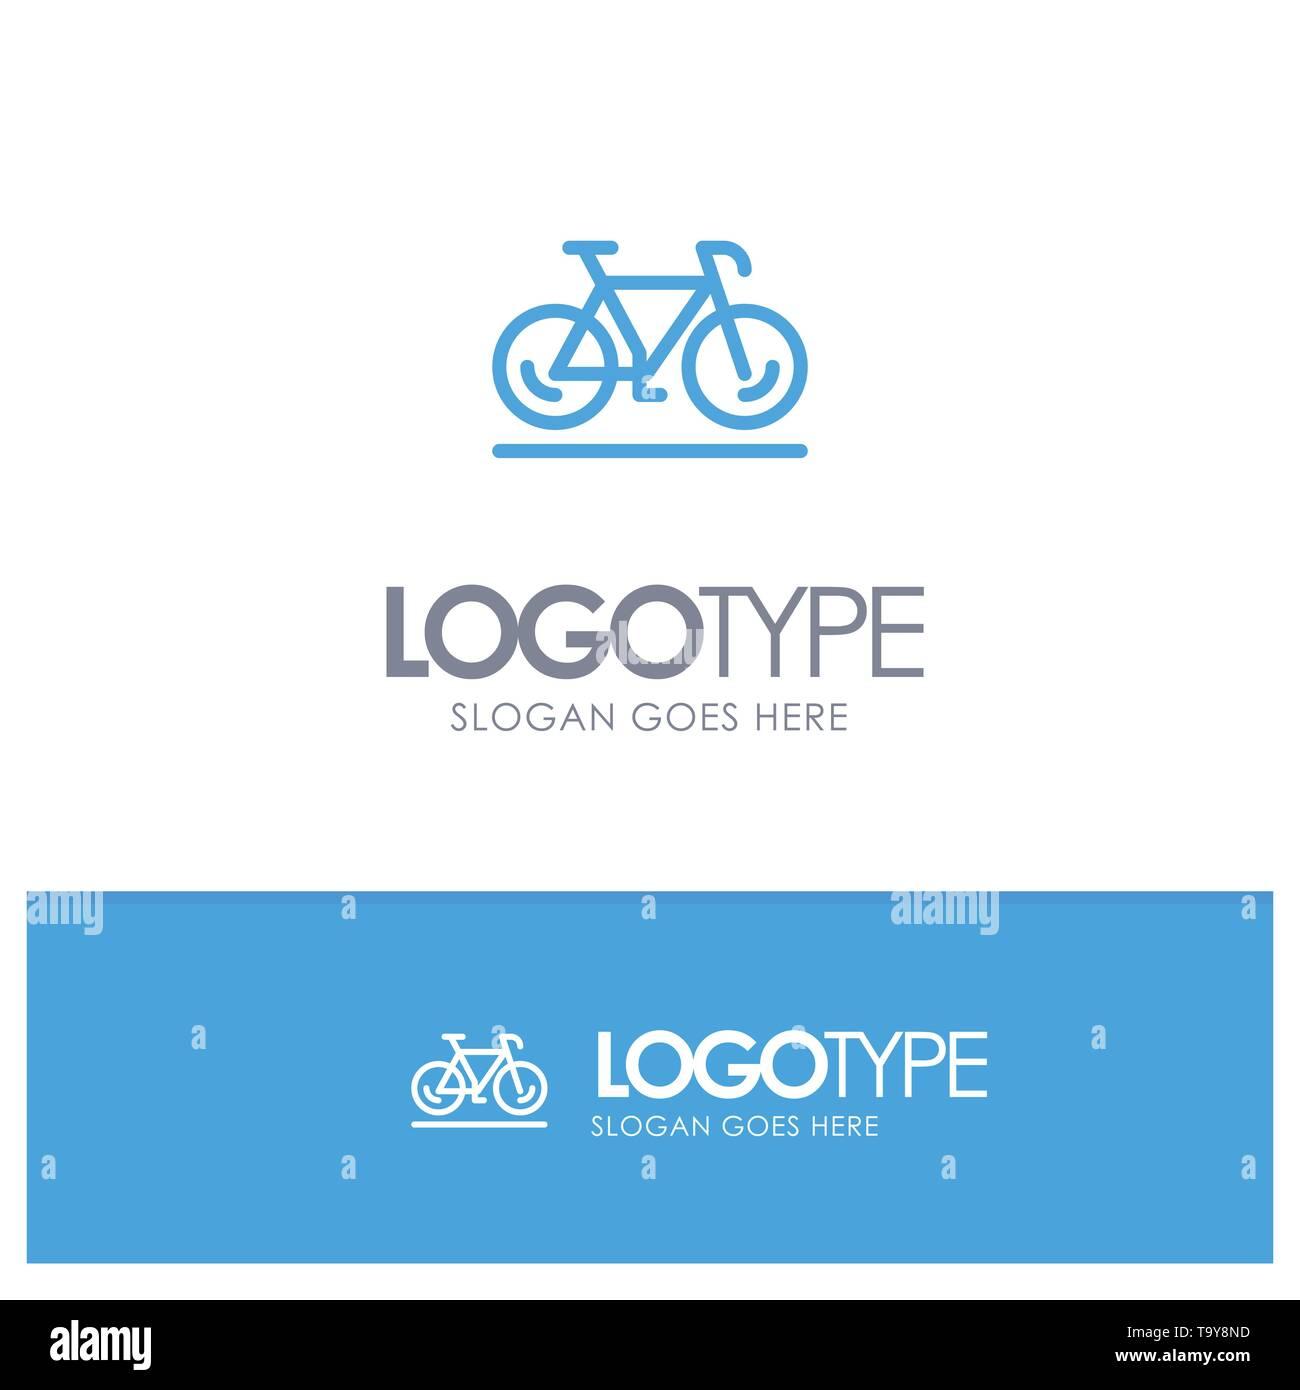 Bicycle, Movement, Walk, Sport Blue Logo Line Style - Stock Image